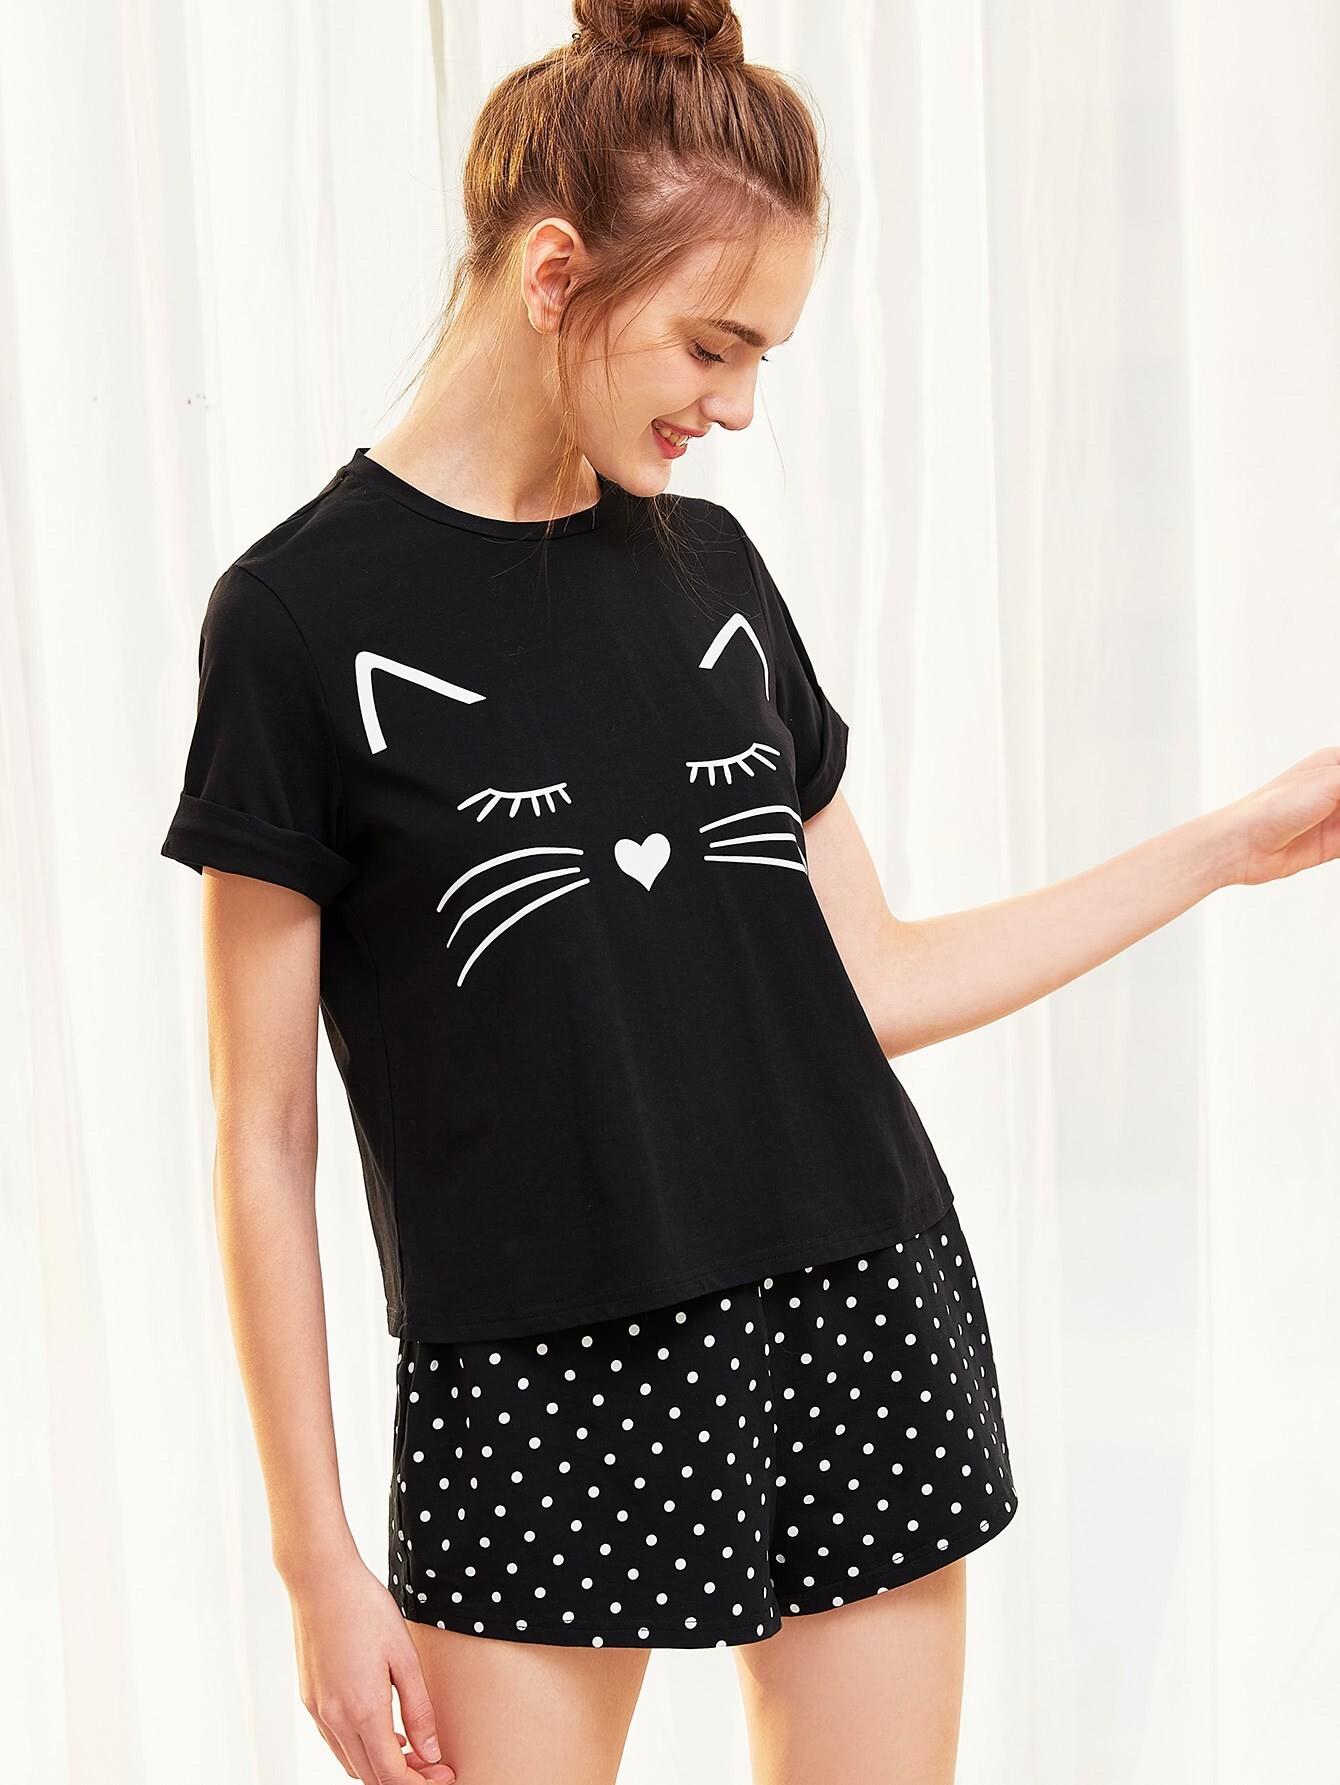 Cat Print Cuffed Top And Polka Dot Shorts Pajama Set high low top and frill hem shorts pajama set